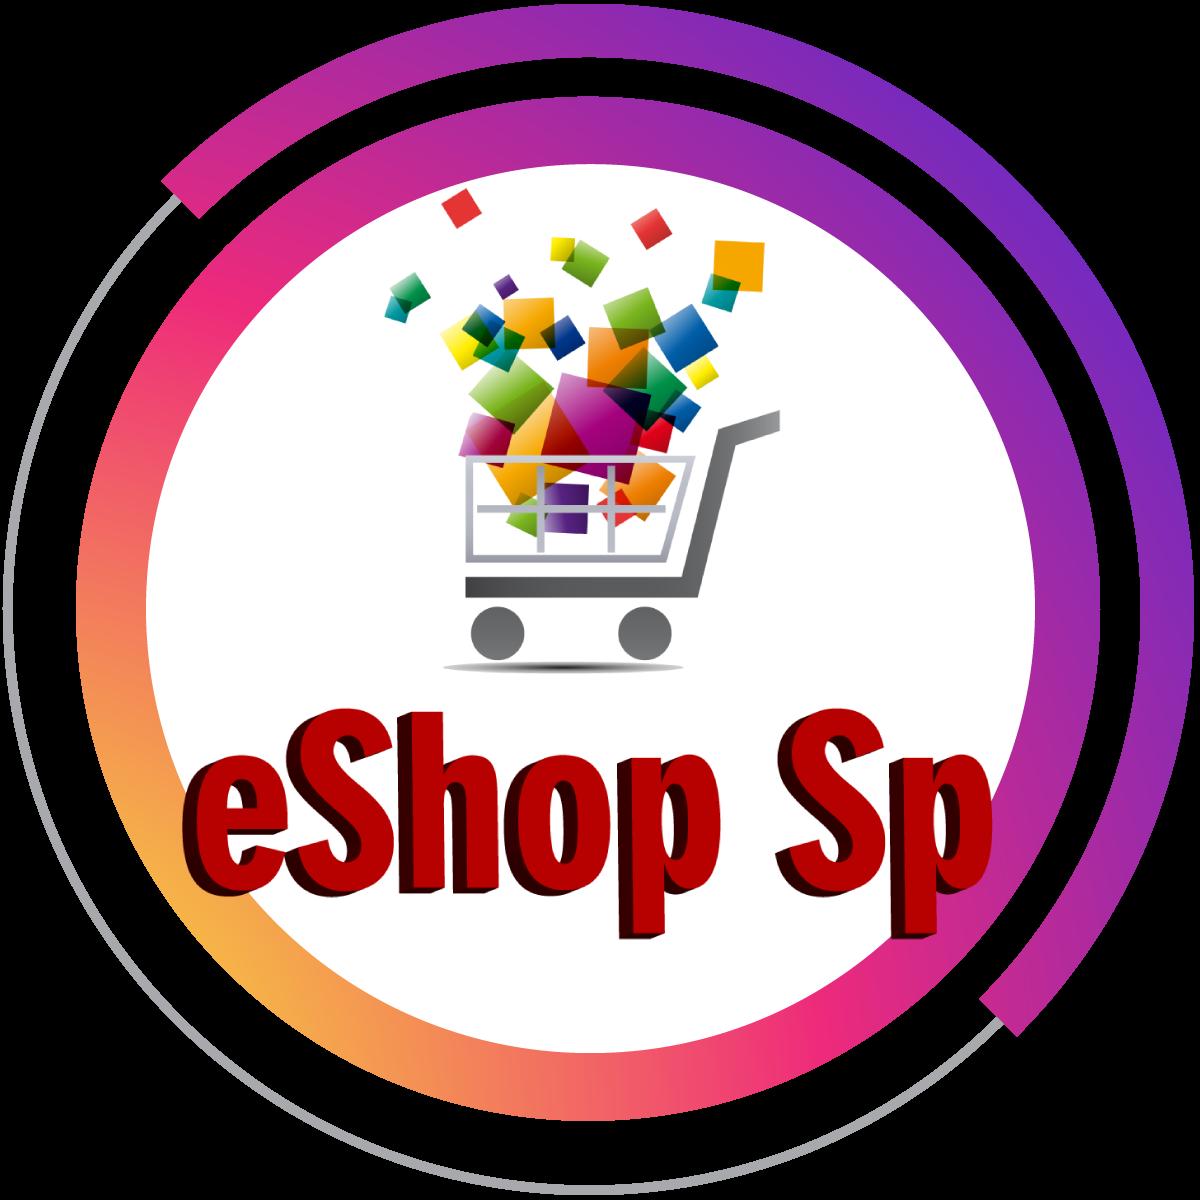 @eshop_sp Profile Image | Linktree